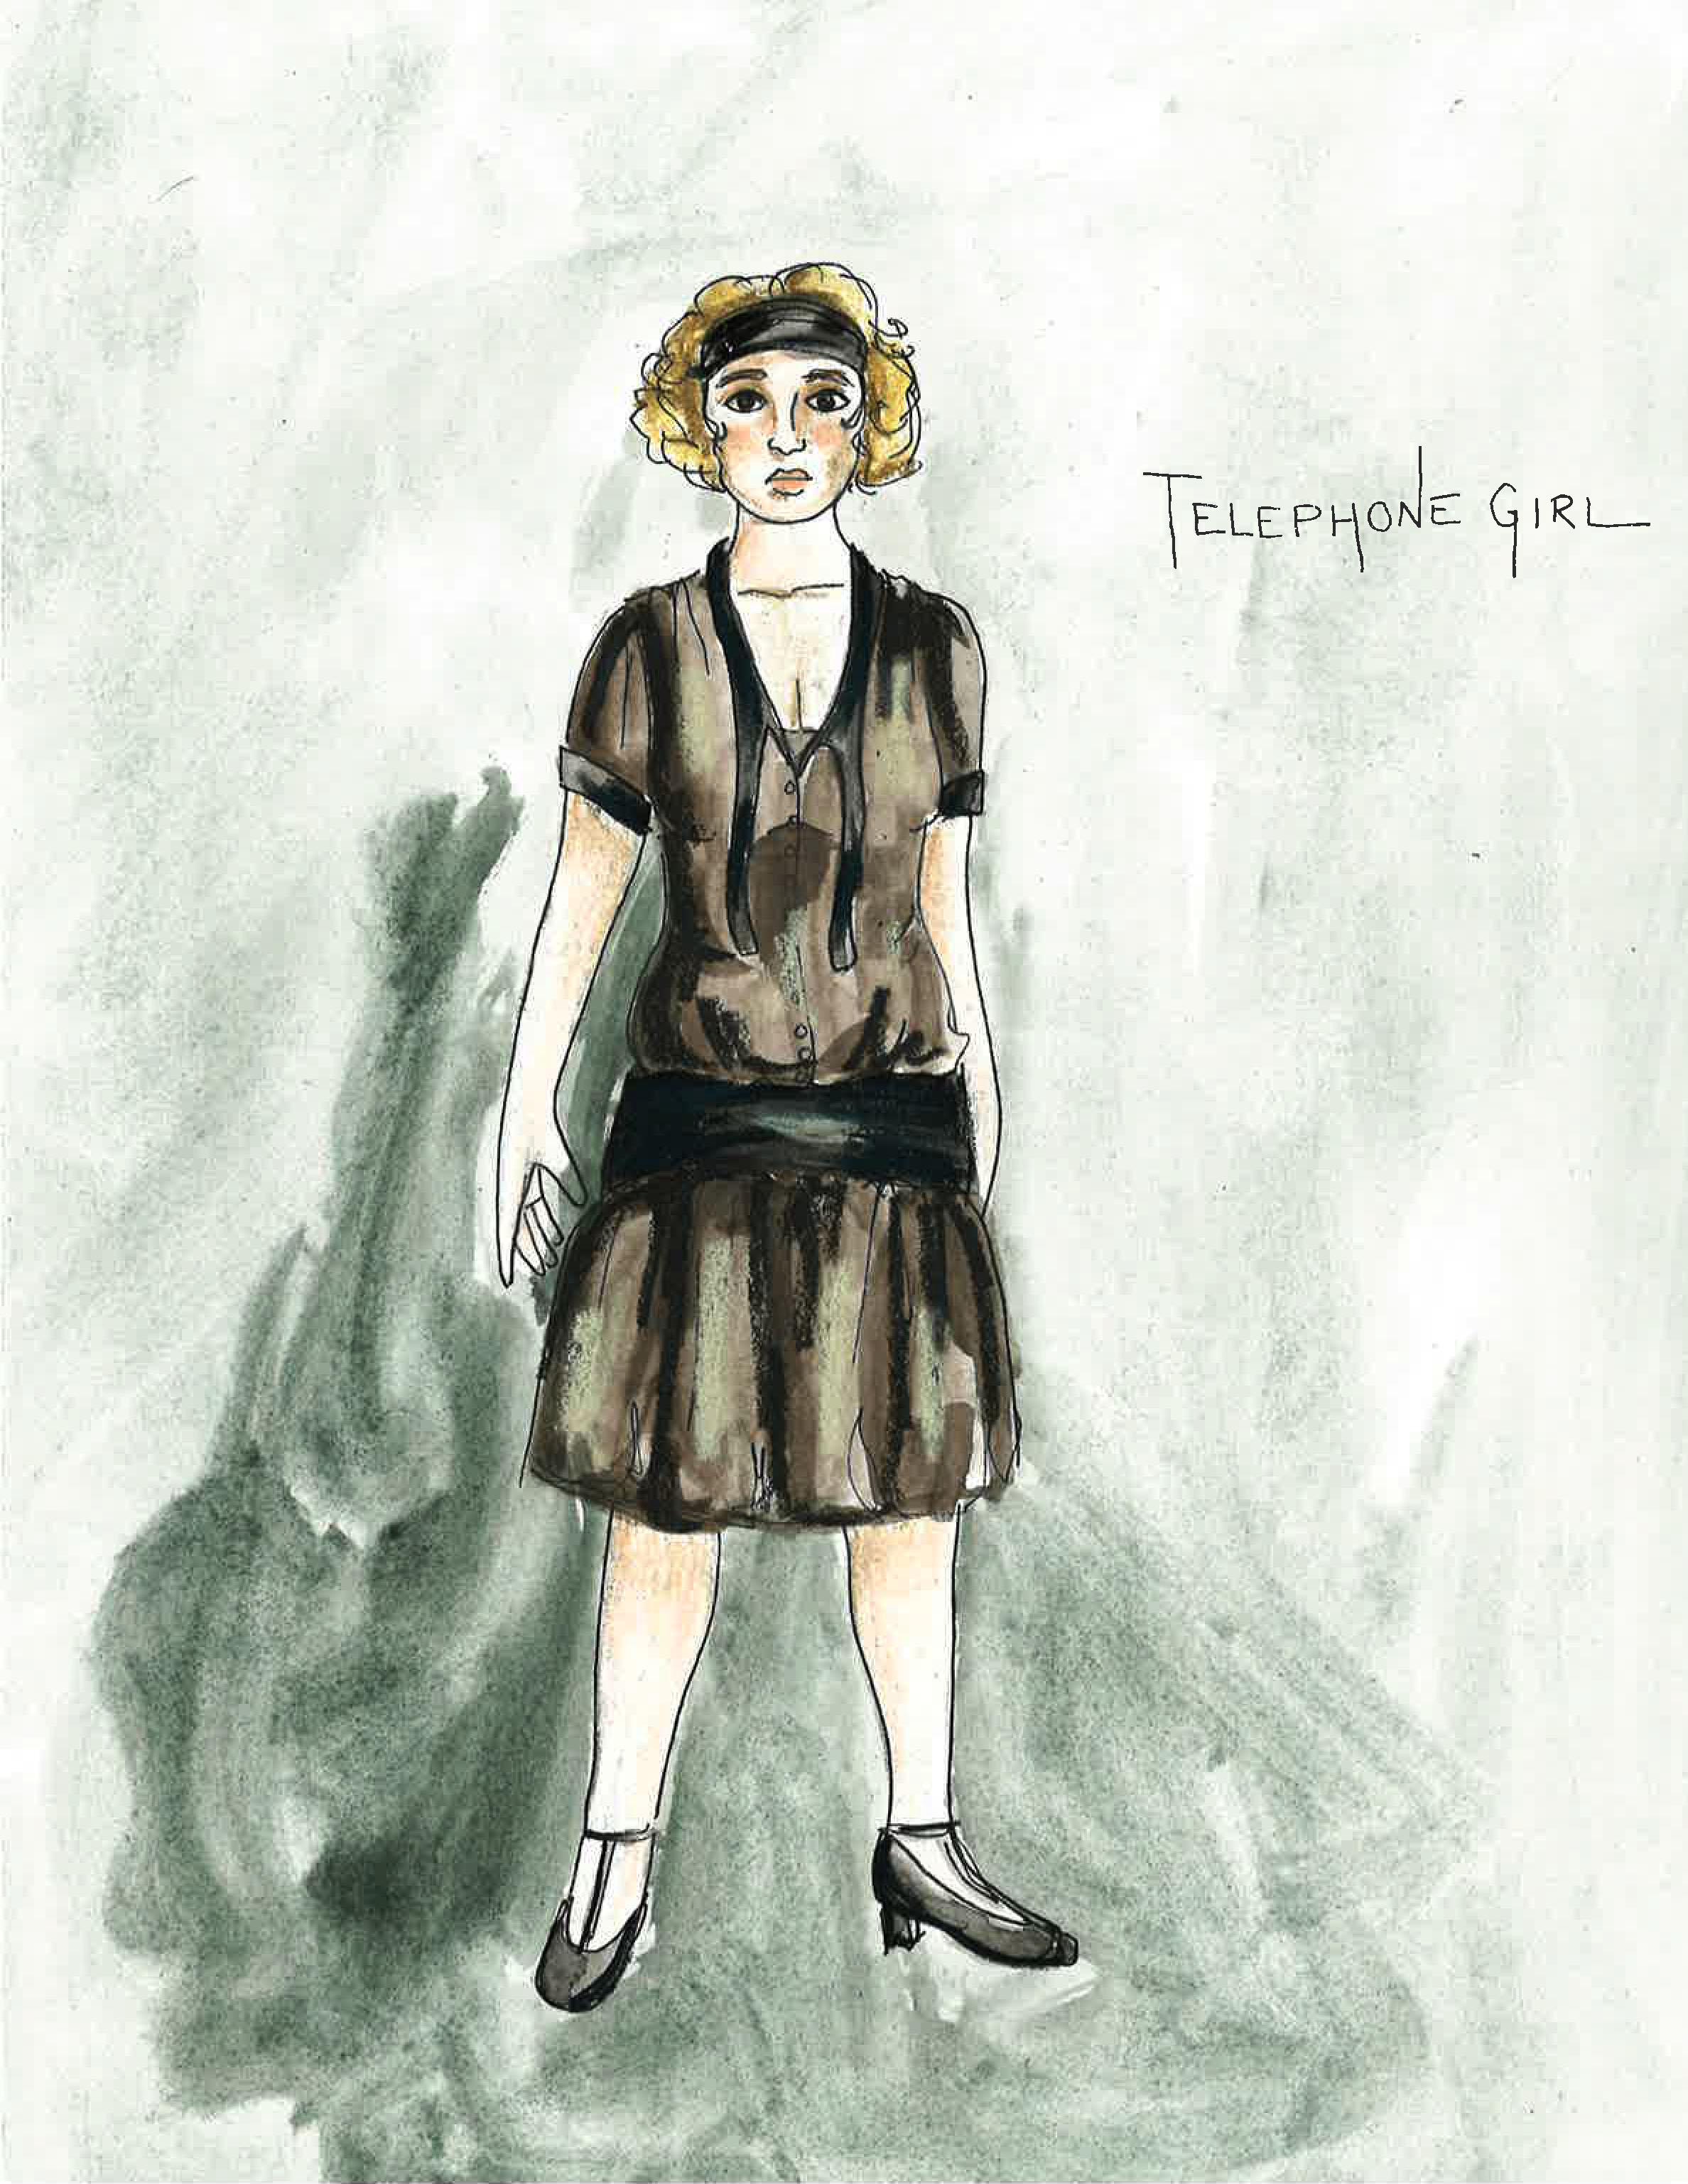 Telephone Girl 2